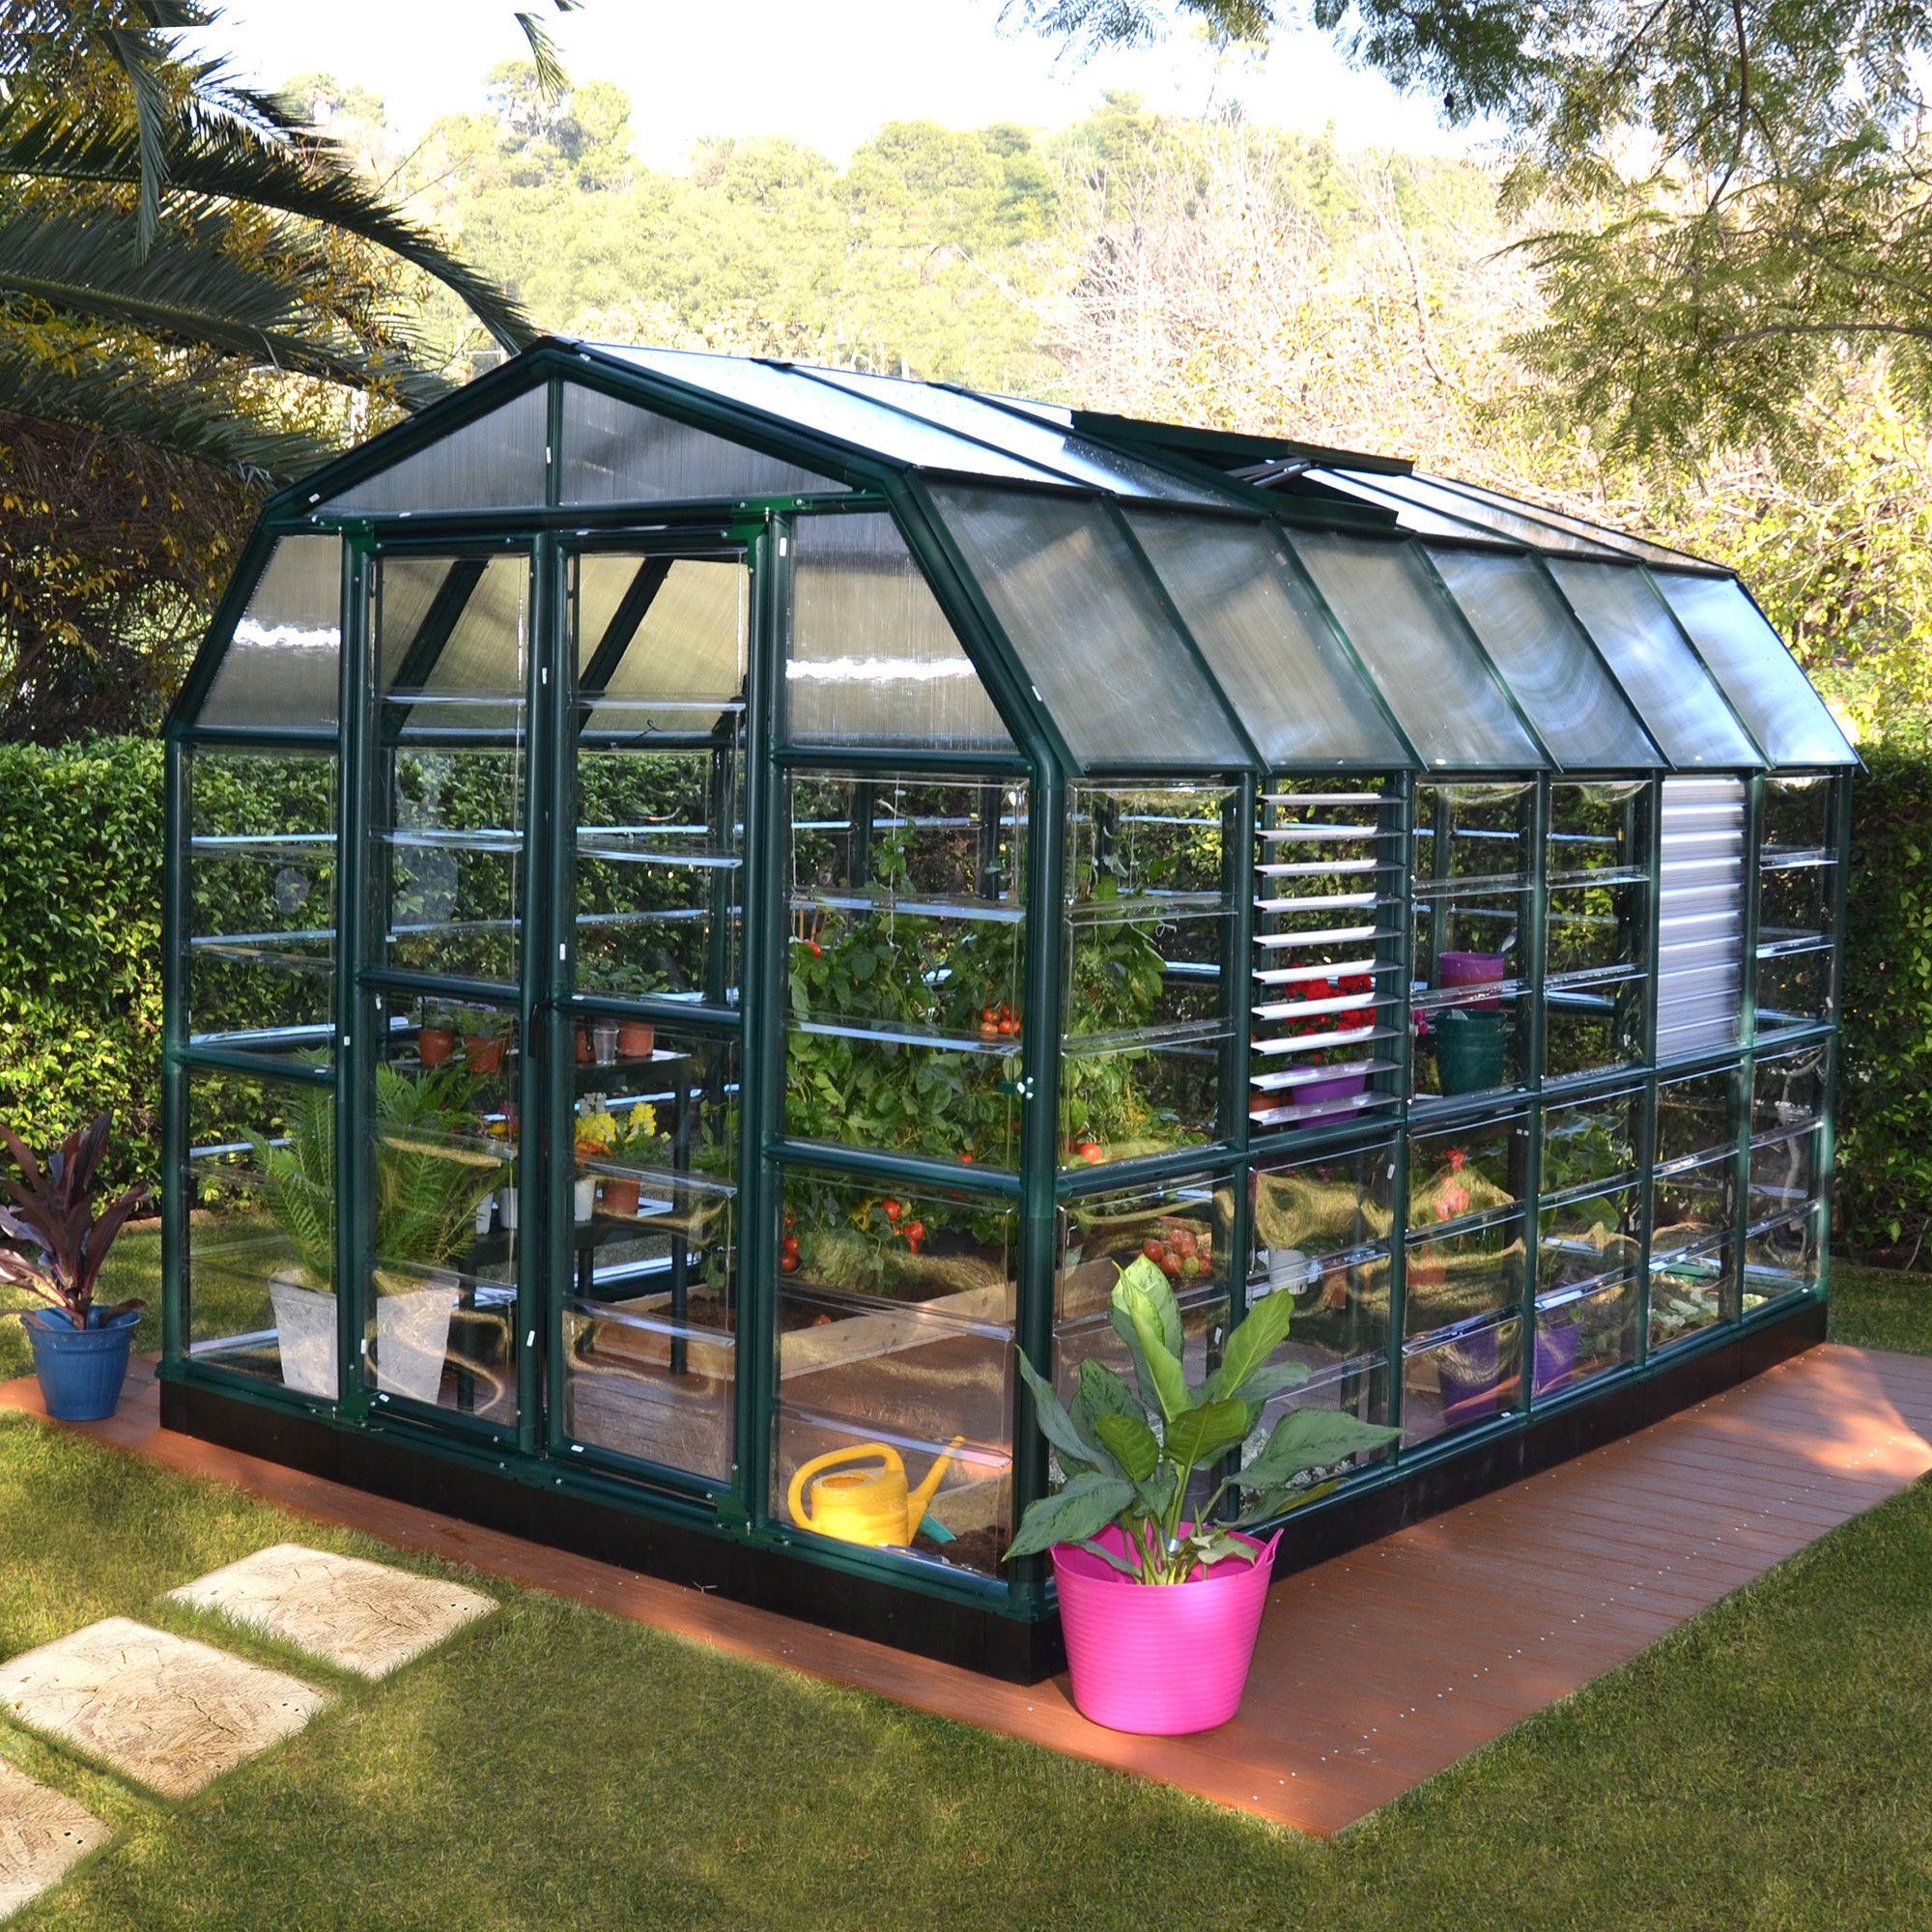 Rion Prestige 2 Clear 9 Ft W X 13 Ft D Polycarbonate Greenhouse